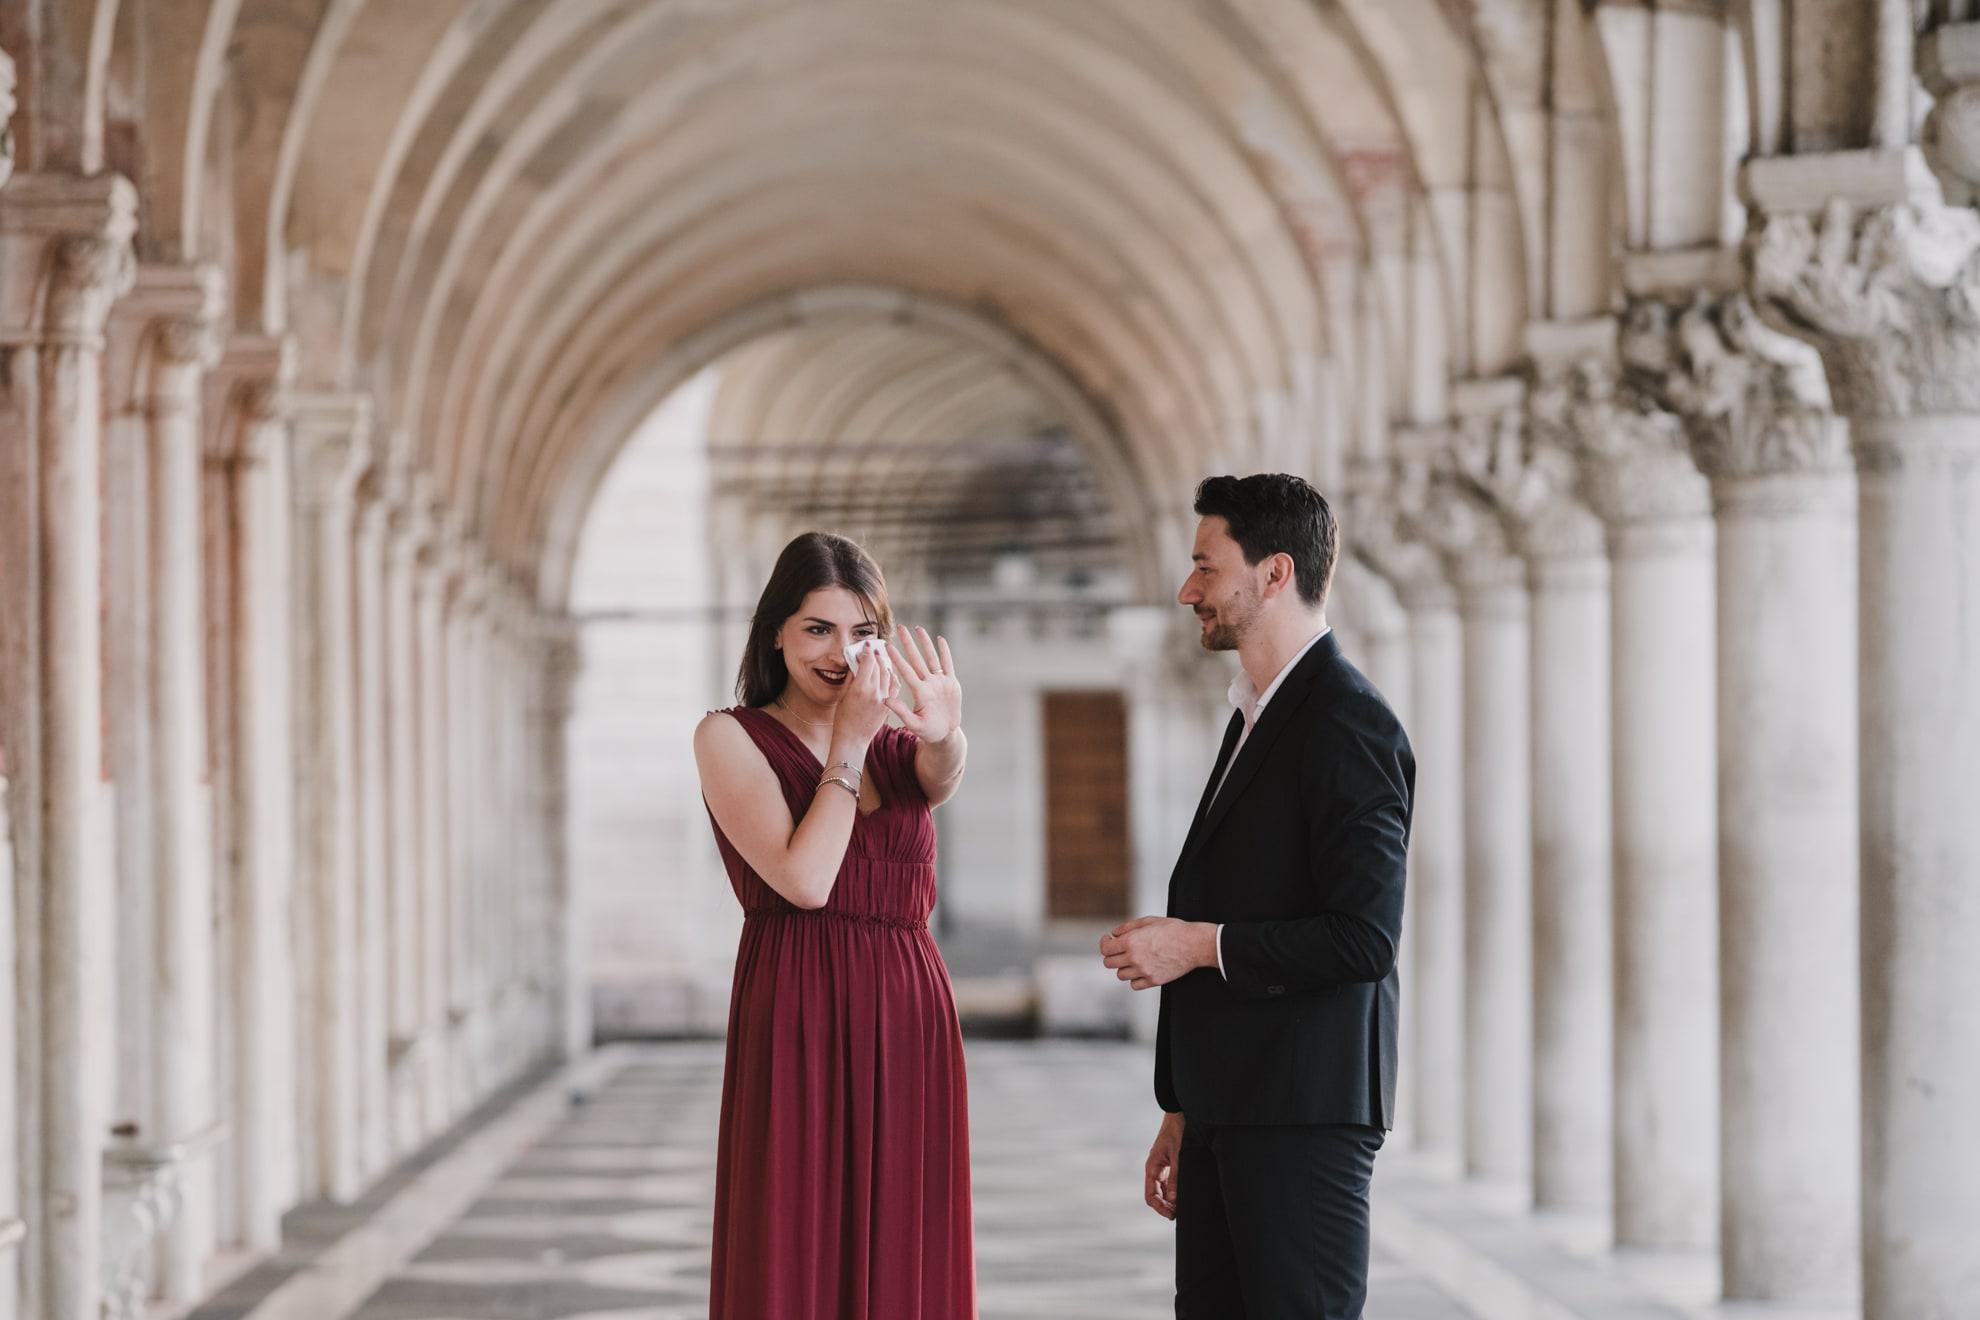 engagement venice venezia proposal proposta matrimonio fidanzamento irene pollacchi fotografa 31